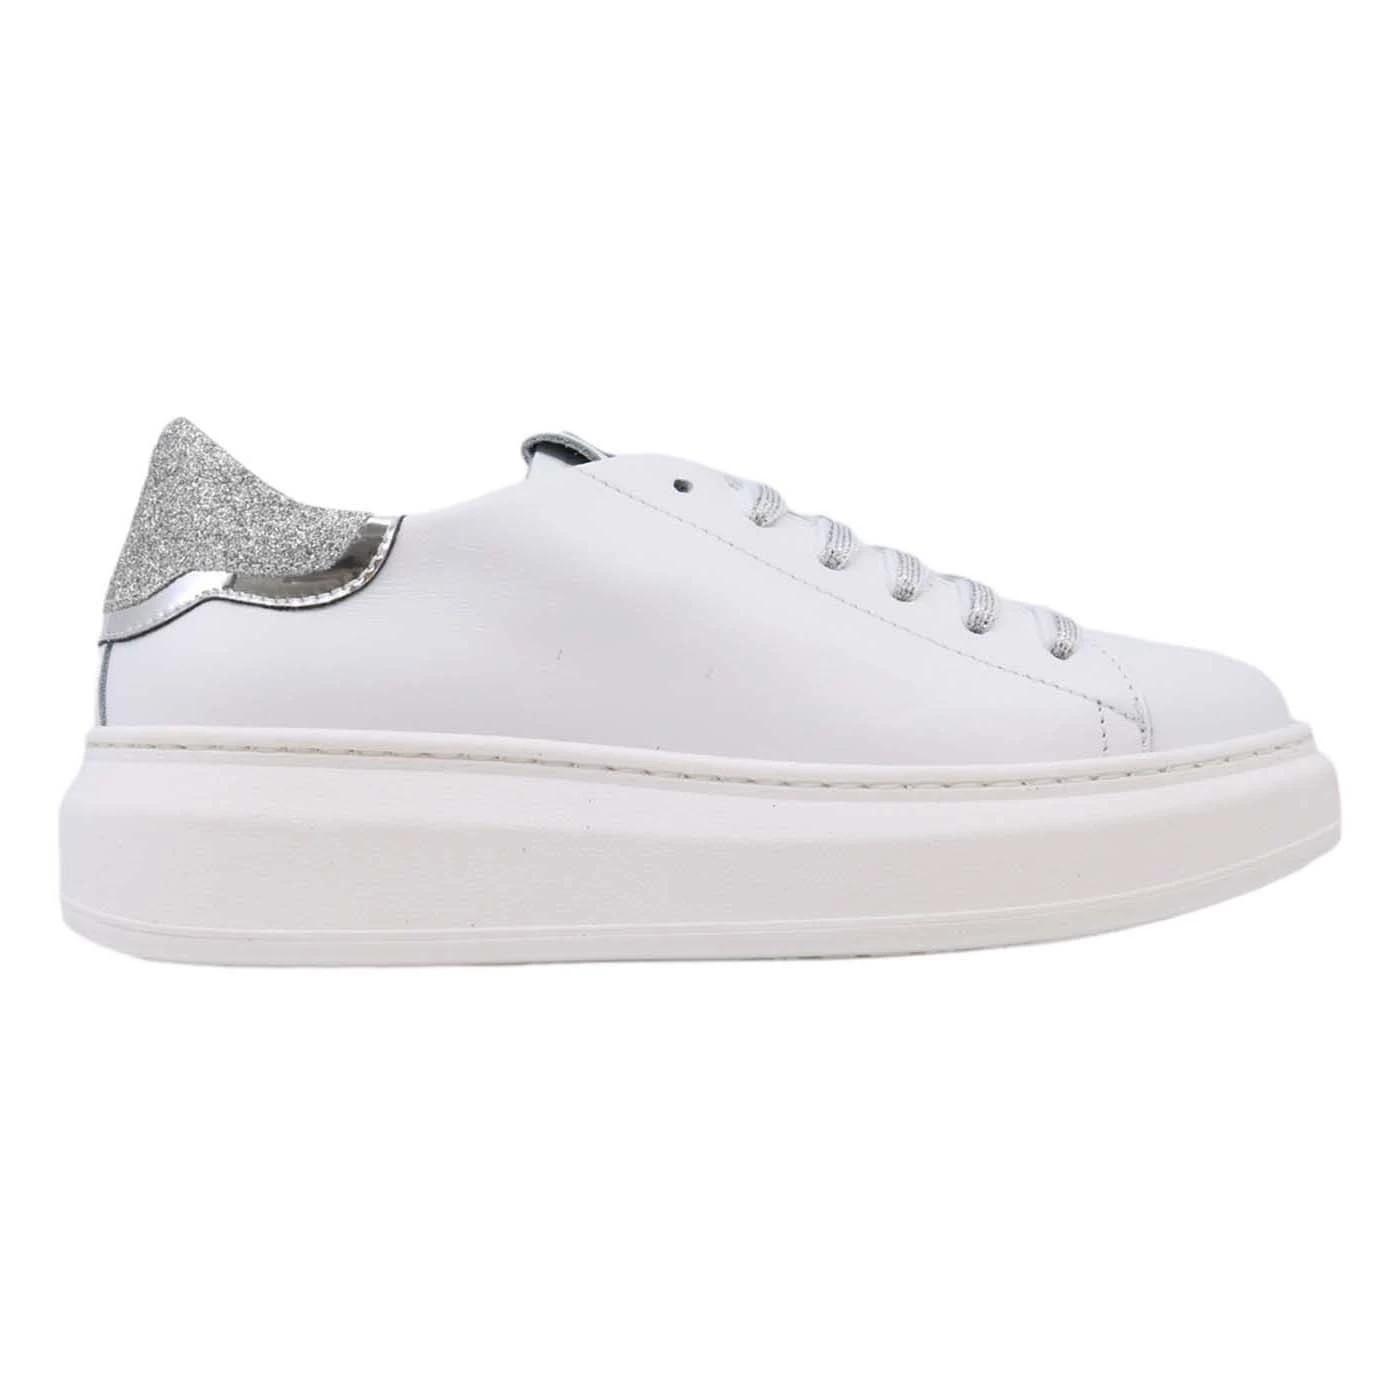 Gio+ G501A Sneaker donna in pelle bianca e argento